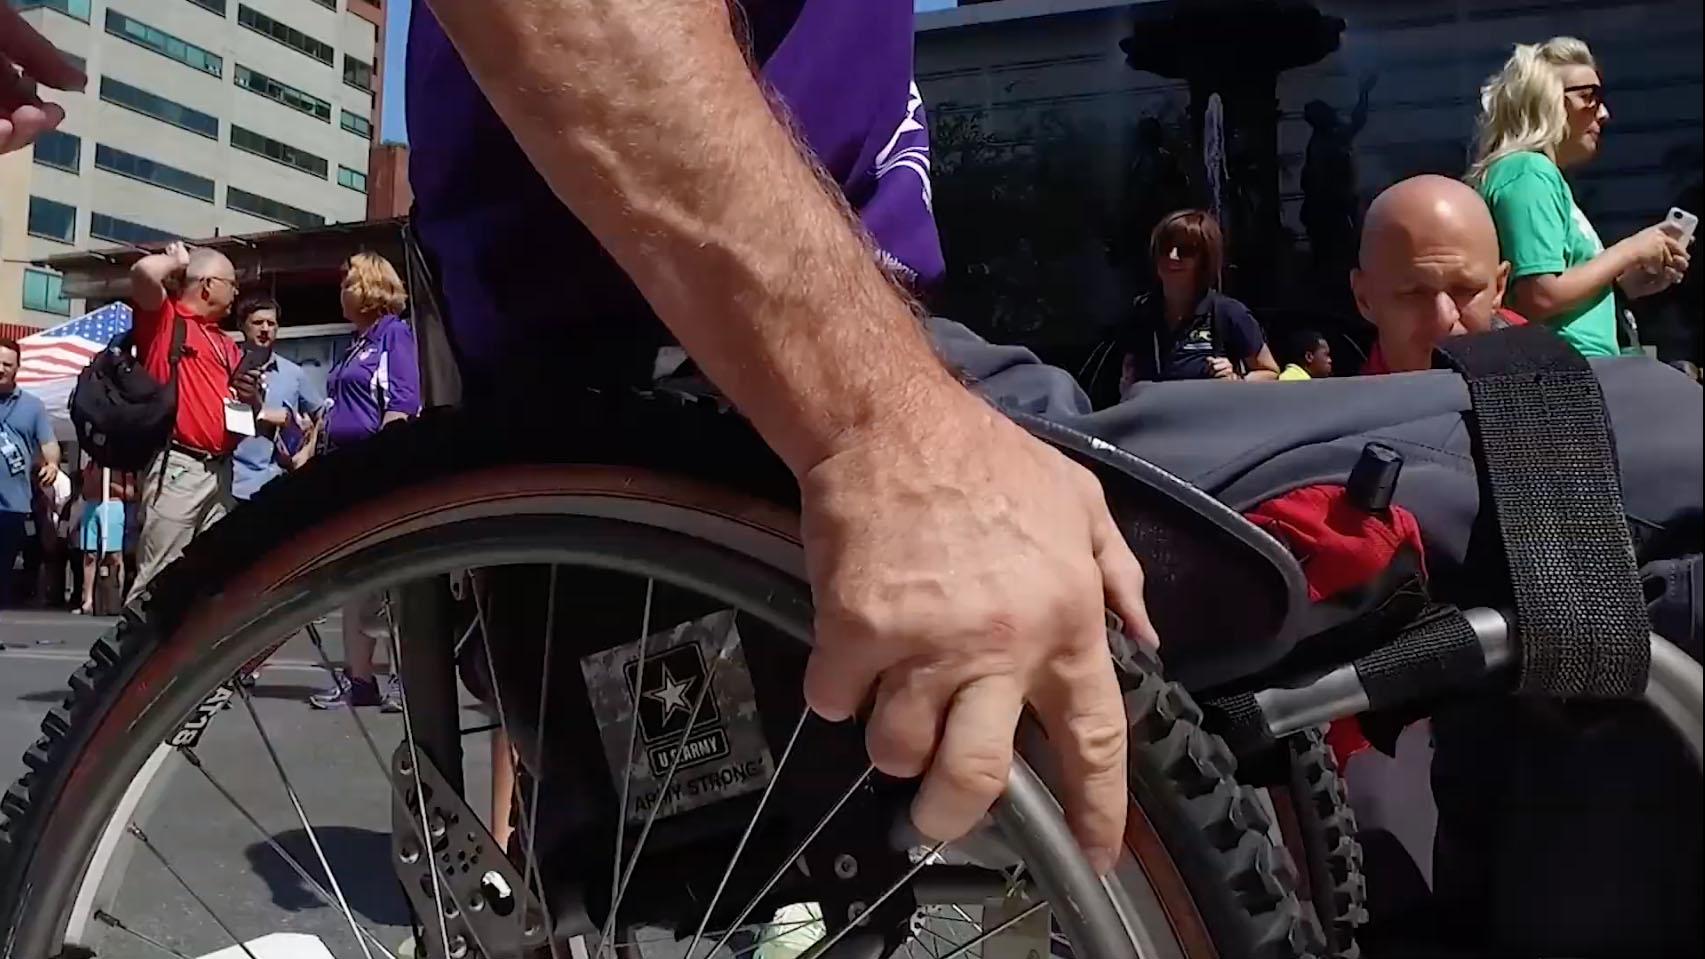 Someone maneuvering their wheelchair